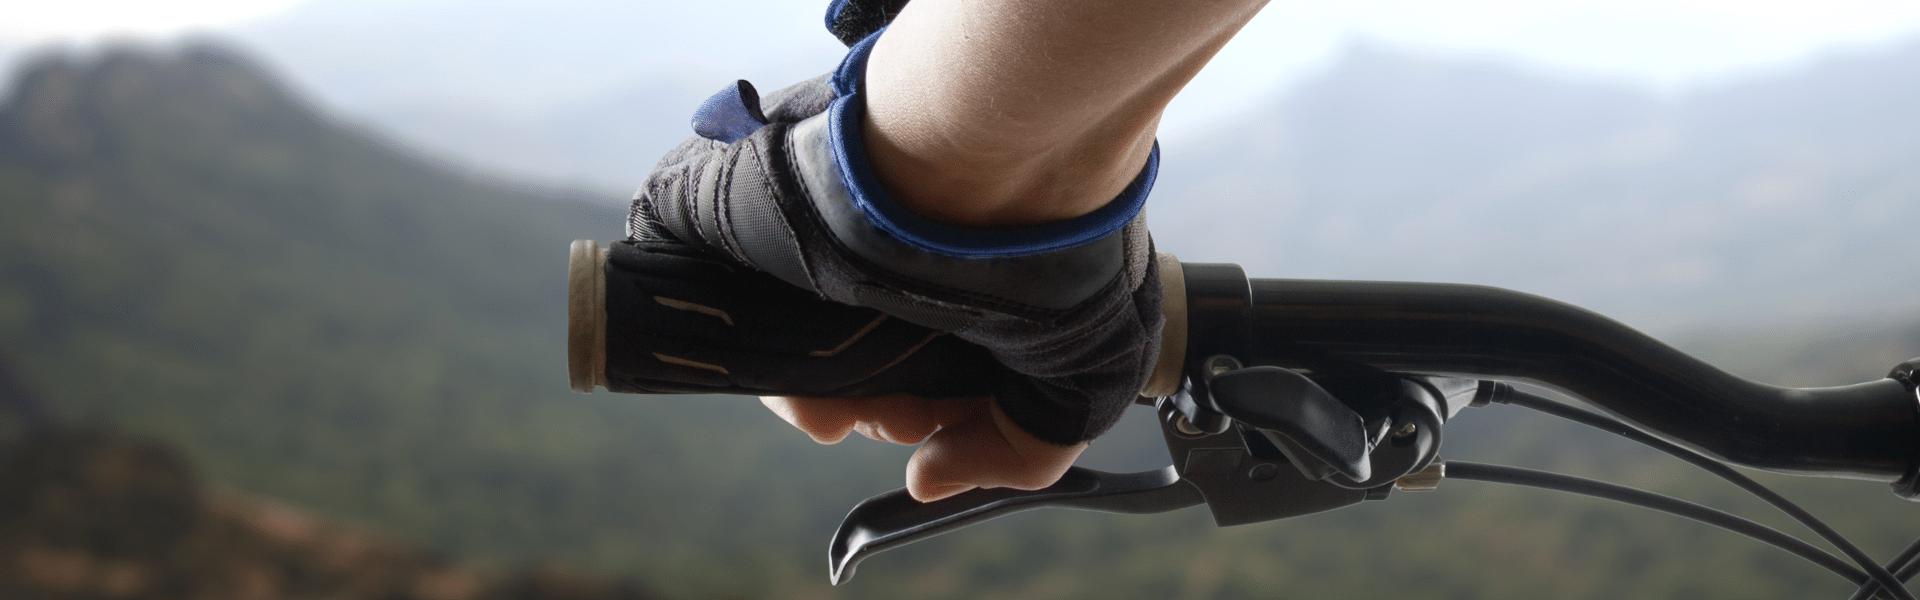 Best Mountain Bike Gloves Reviewed in Detail